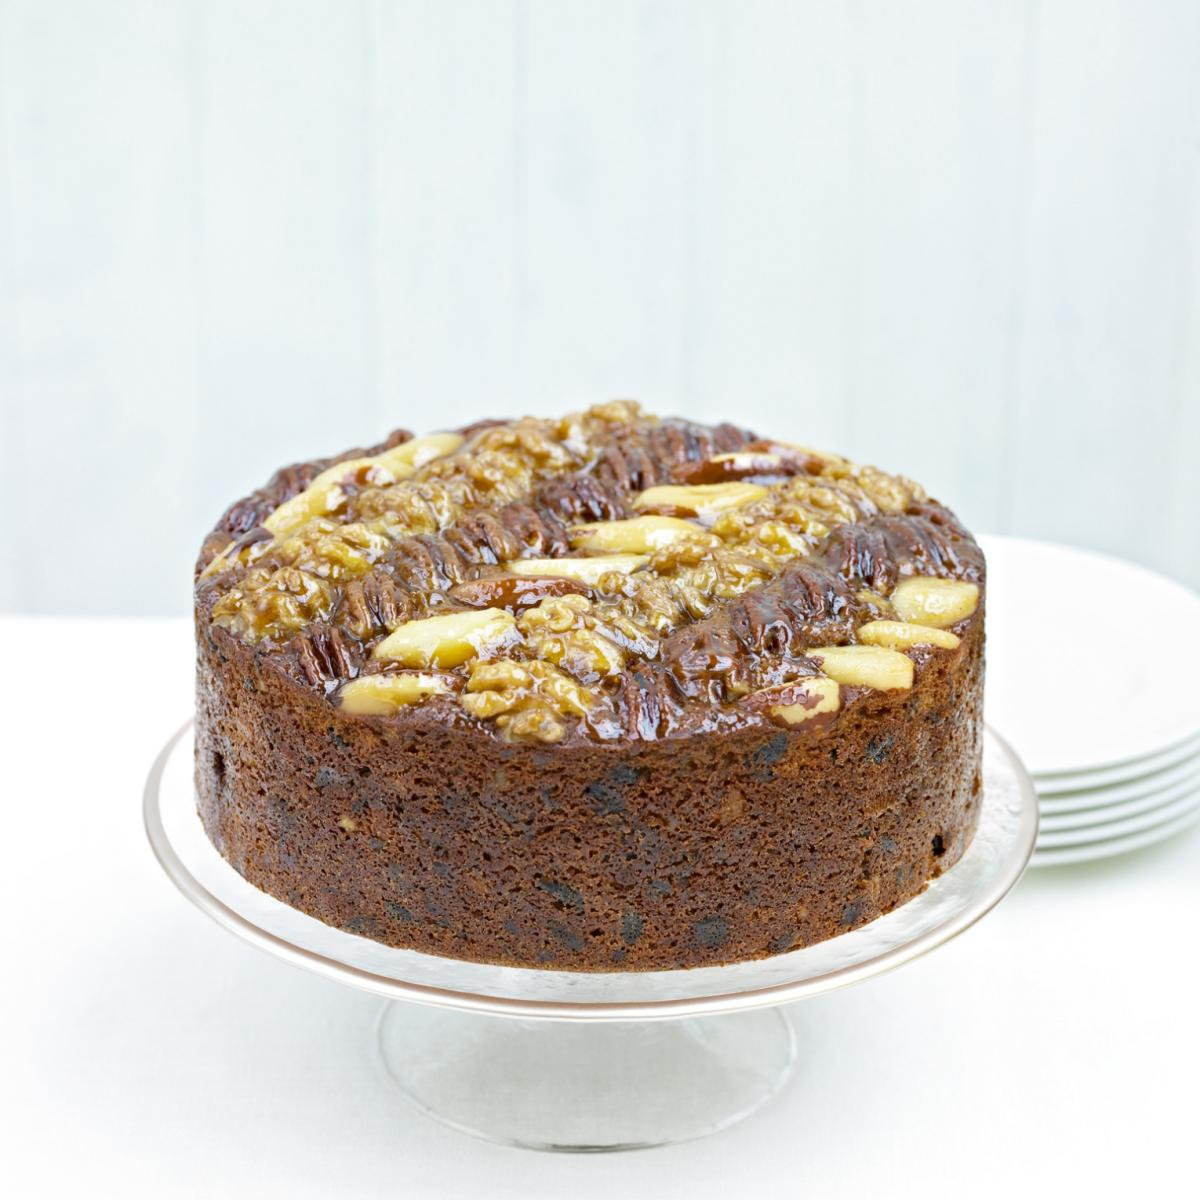 European Easter Cake Recipes